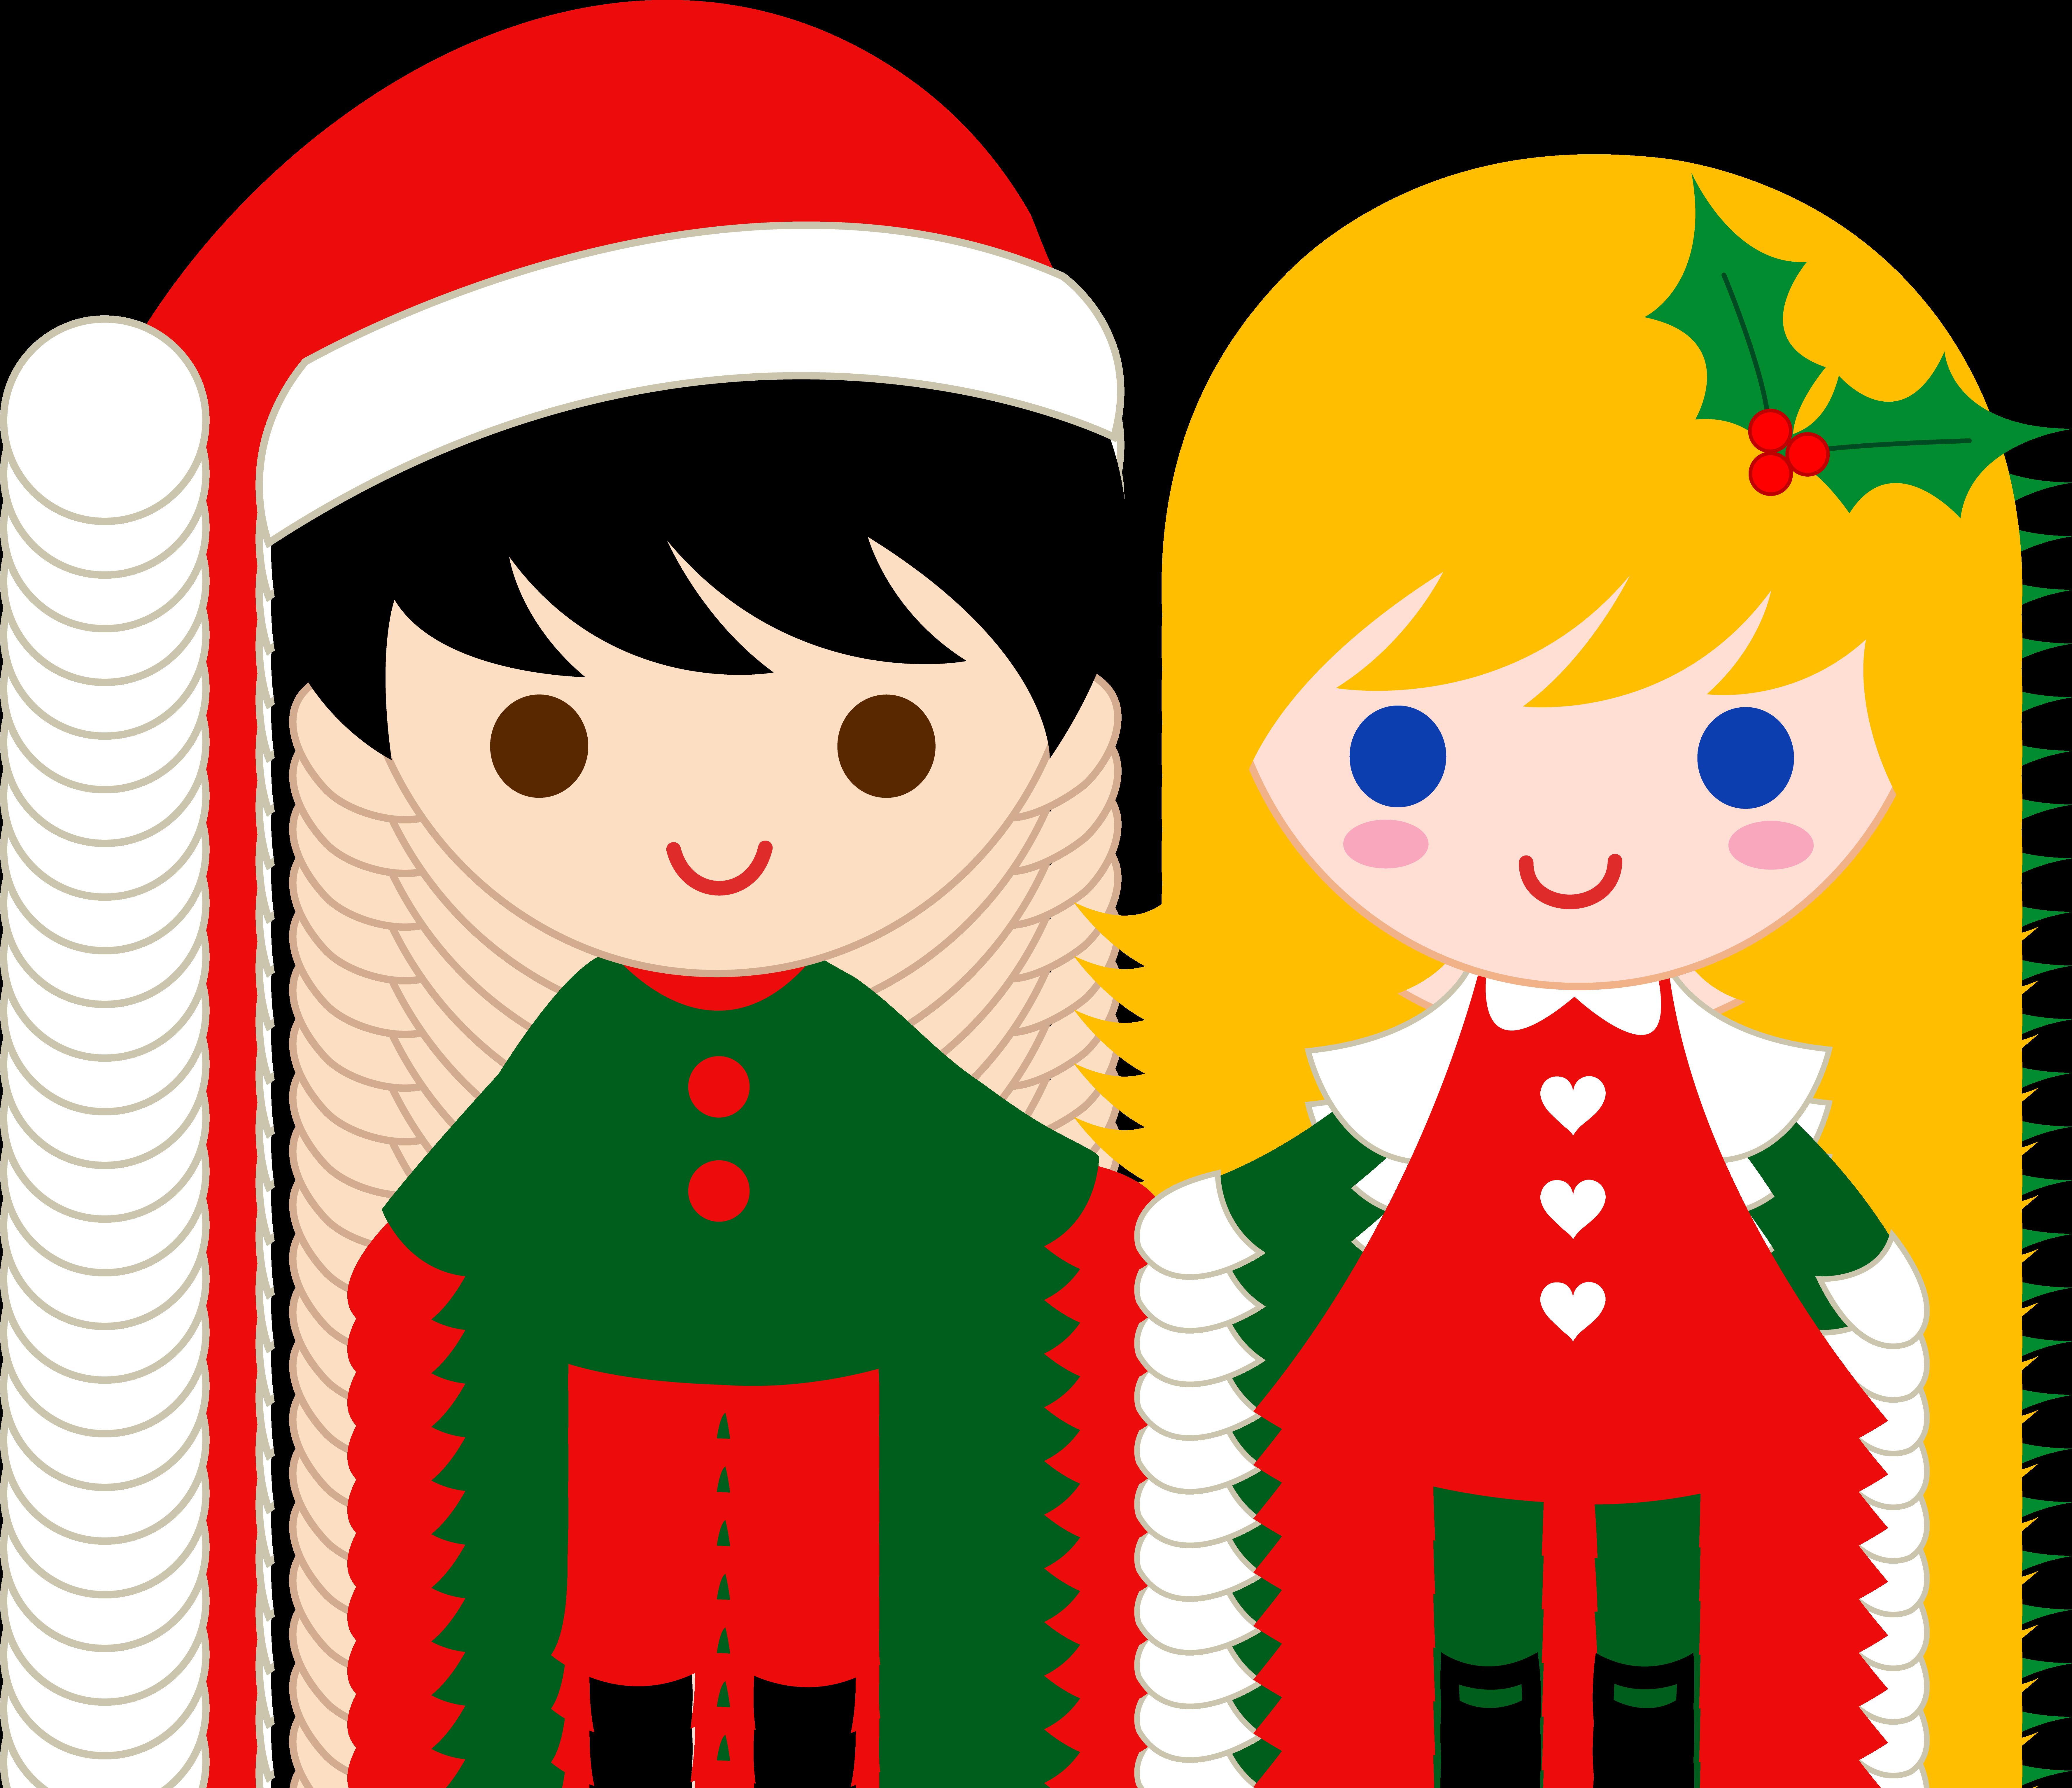 7105x6130 59 Free December Clipart